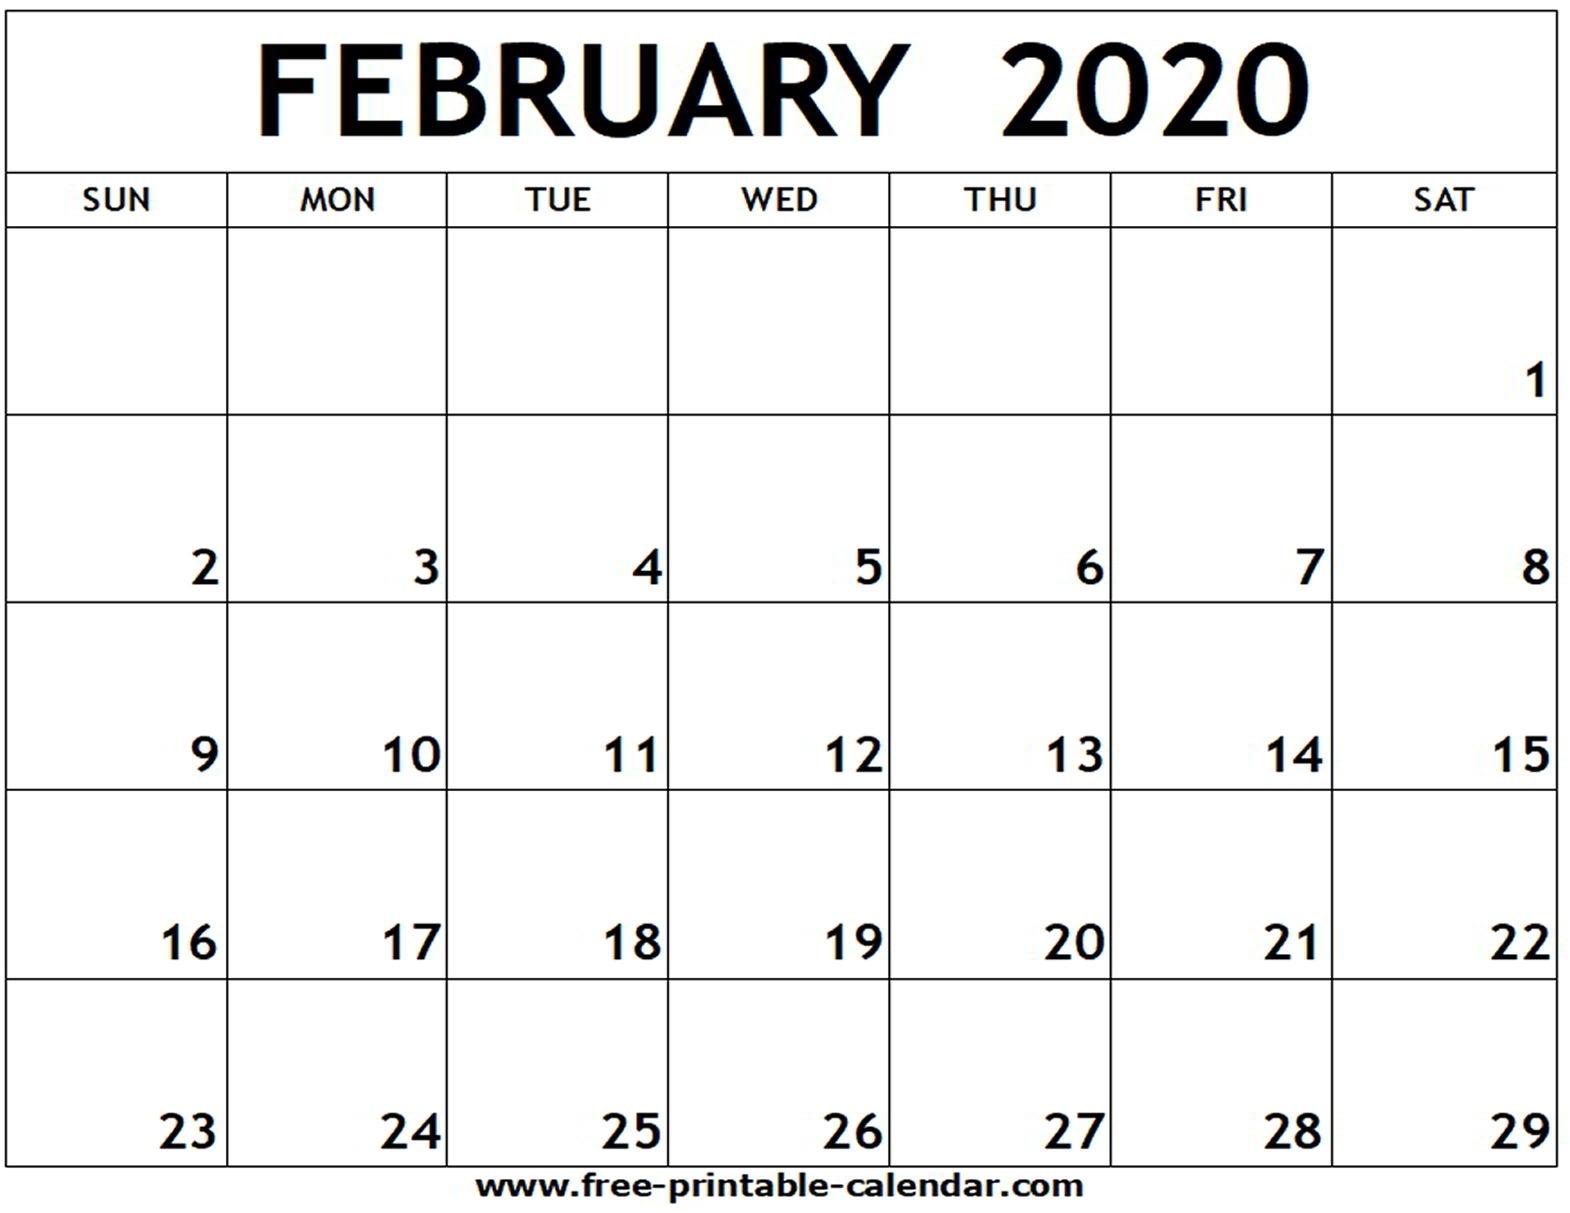 February 2020 Printable Calendar - Free-Printable-Calendar pertaining to Free Printable 2020 Calendar To I Can Edit